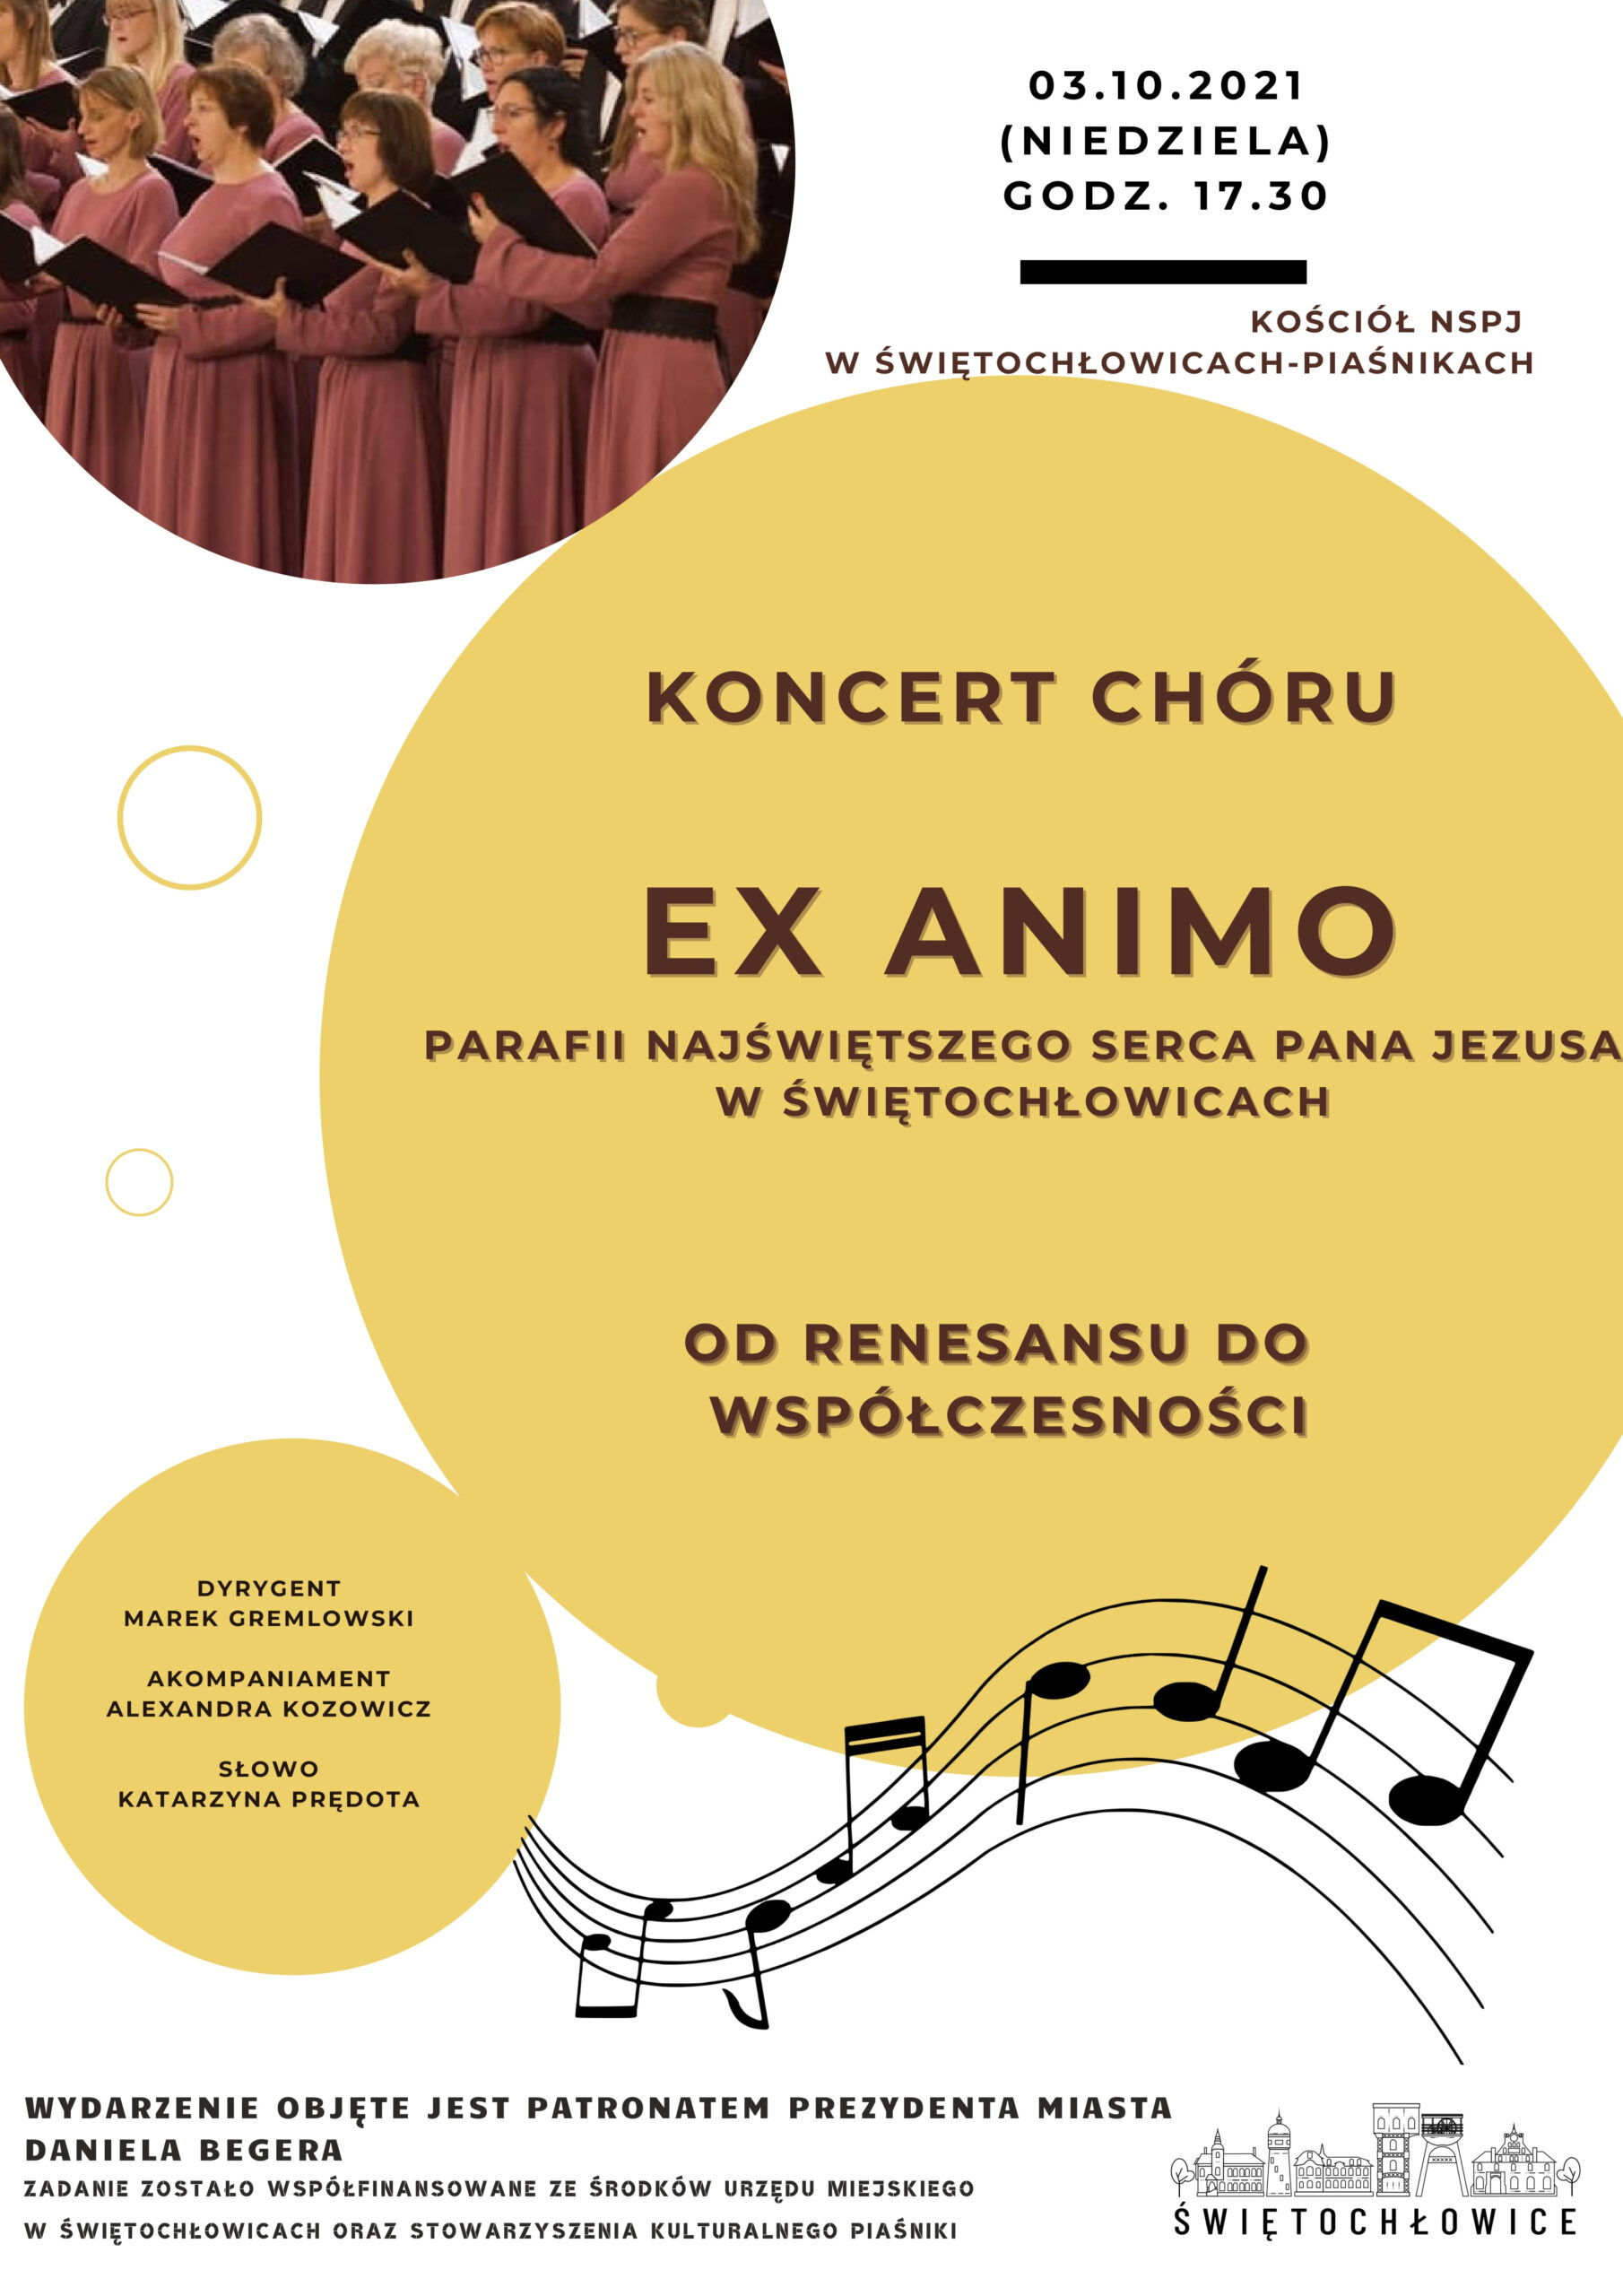 Koncert chóru EX ANIMO